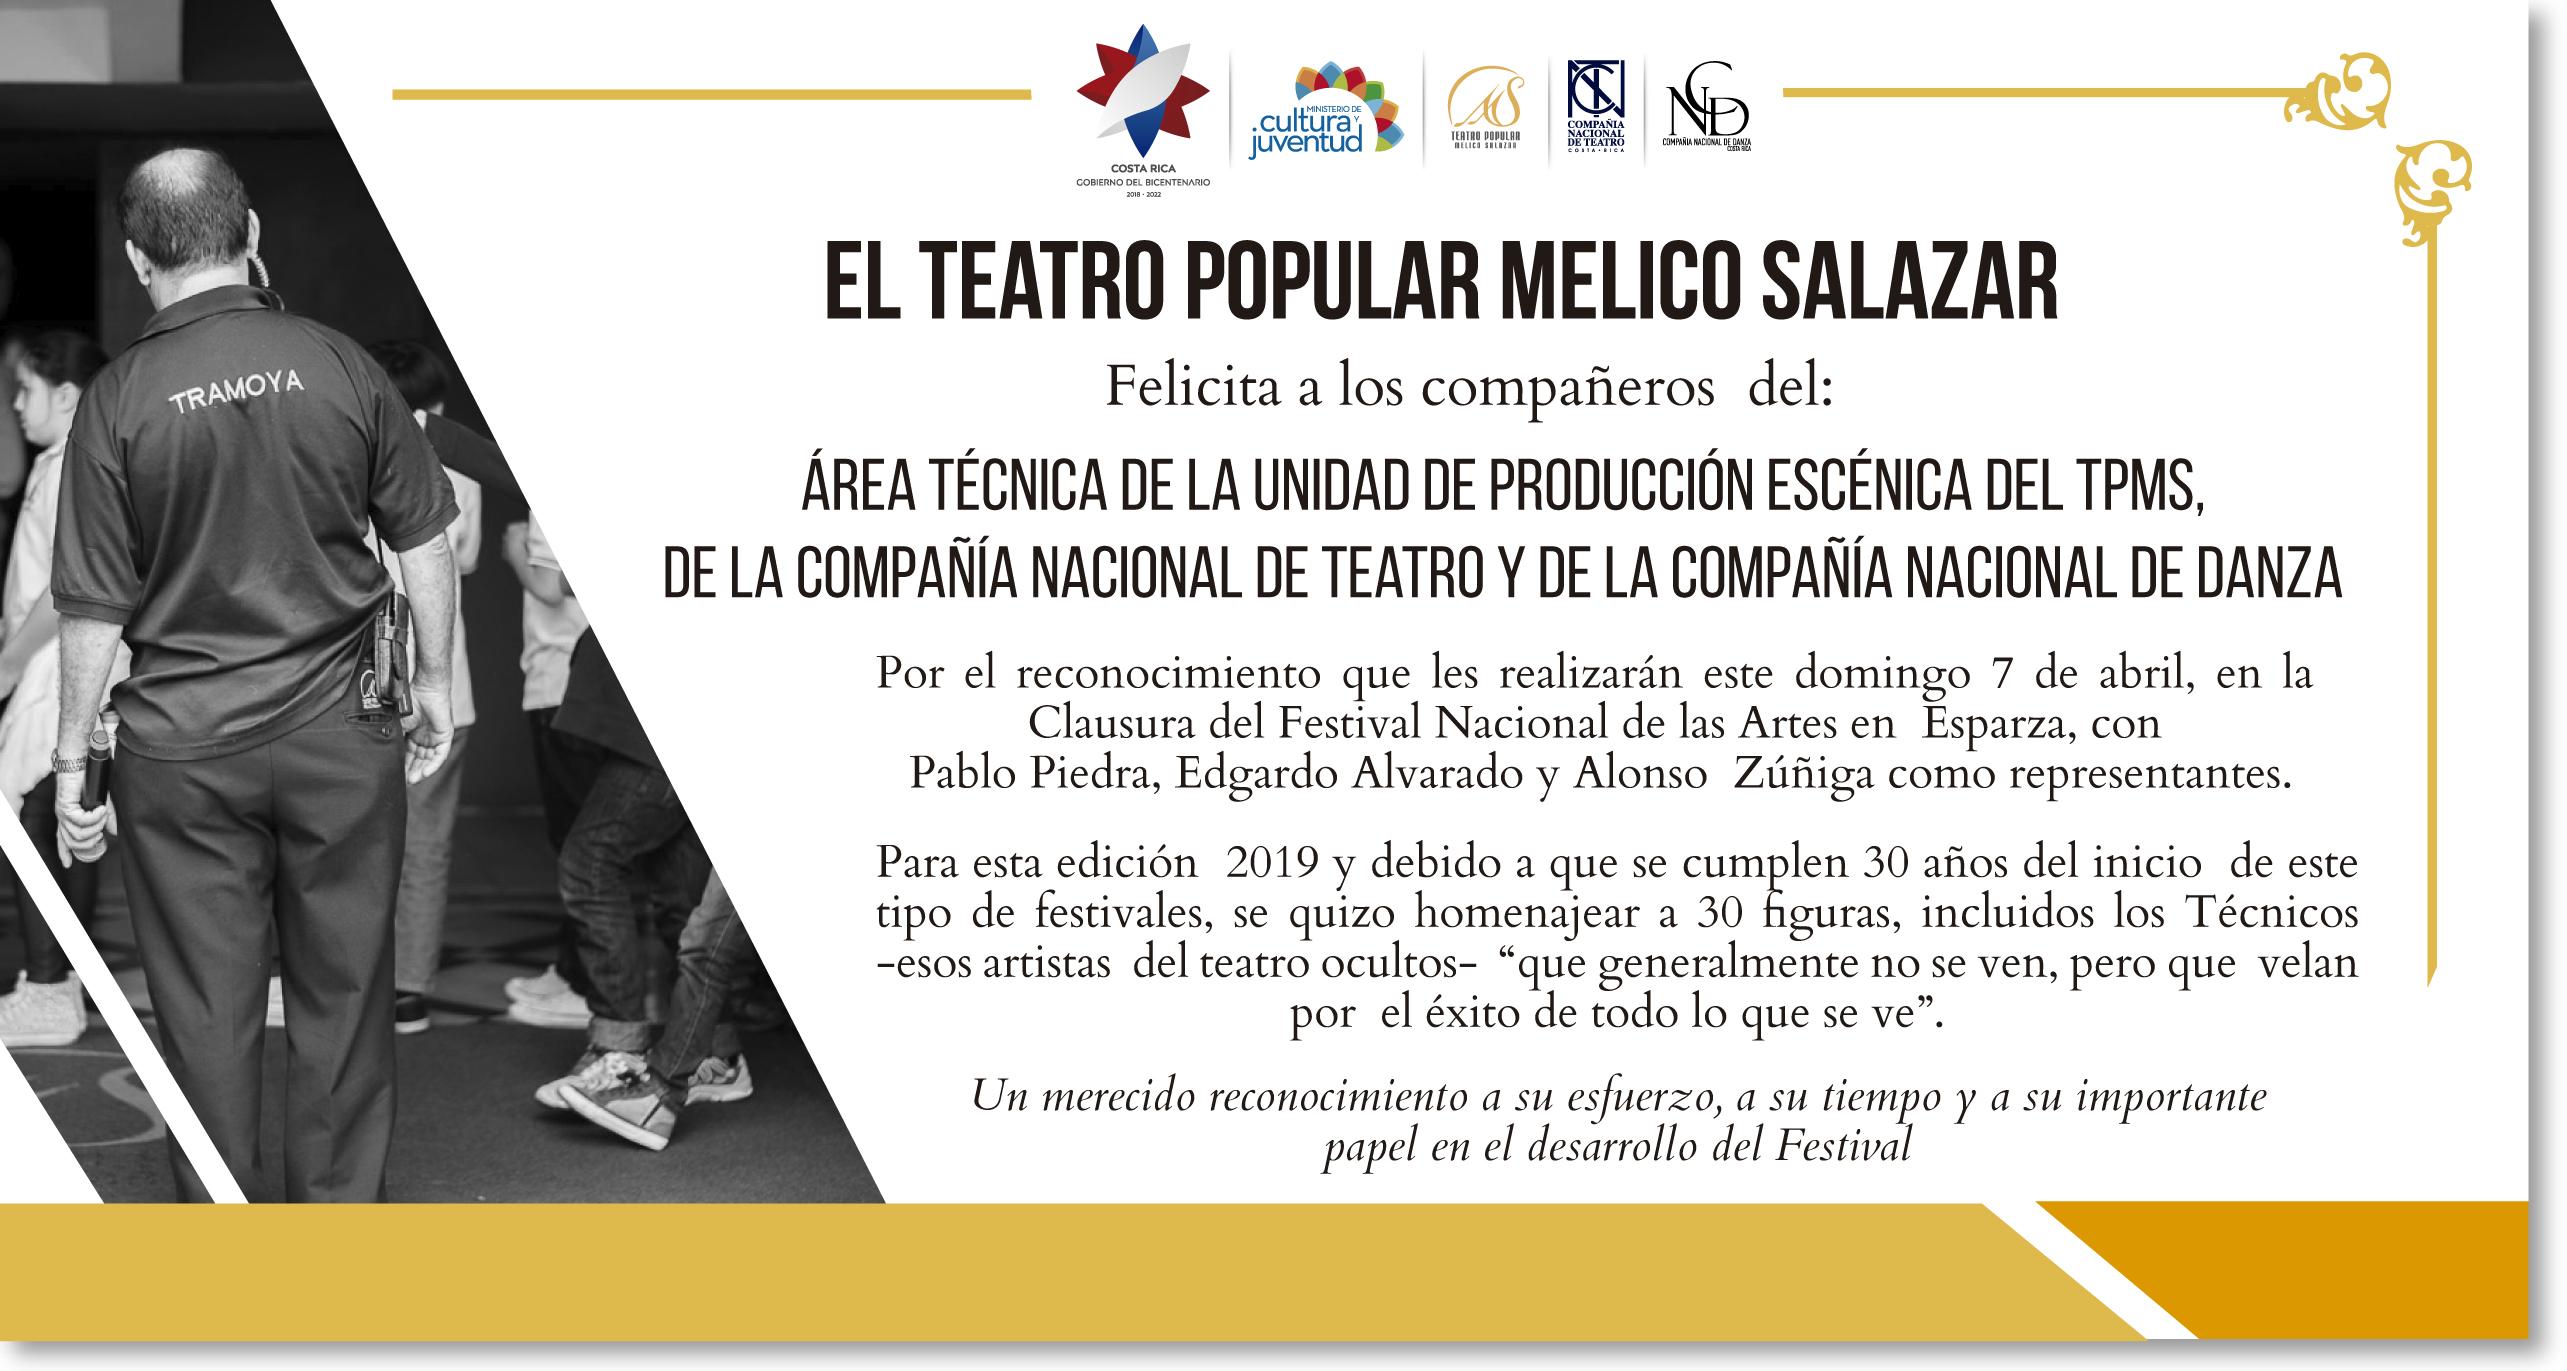 https://teatromelico.go.cr/images/ReconocimientoTécnicos-01.jpg